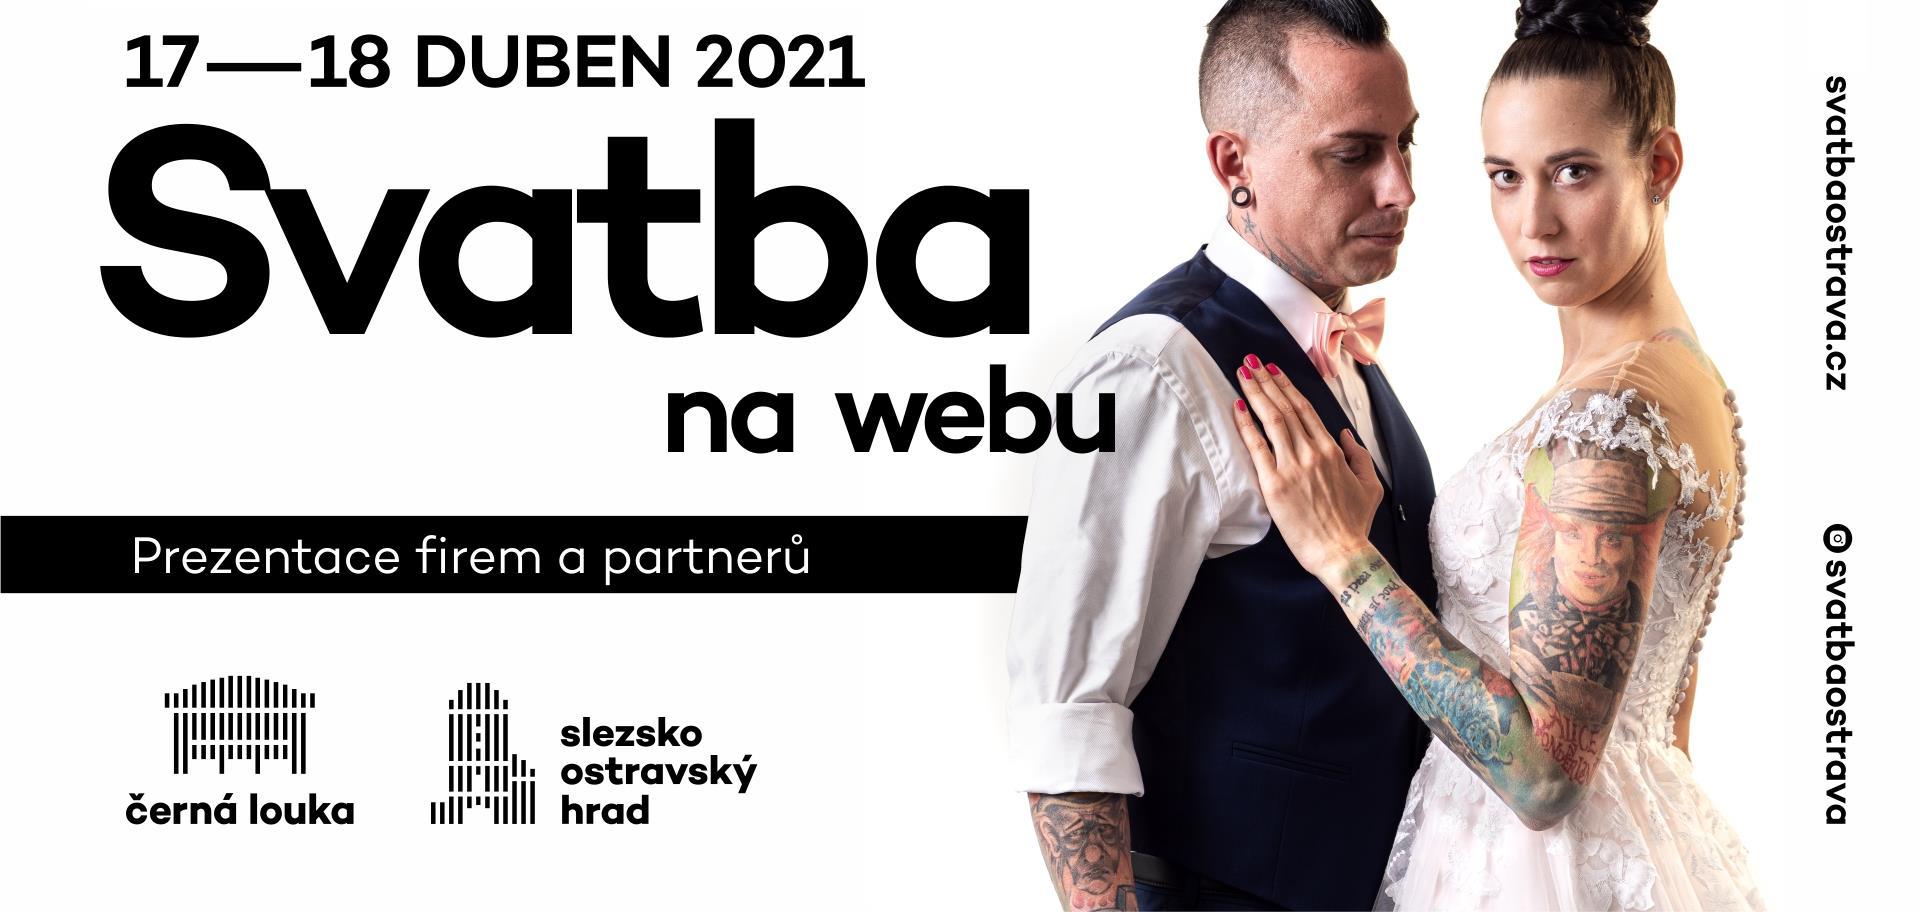 Svatba na webu 2021